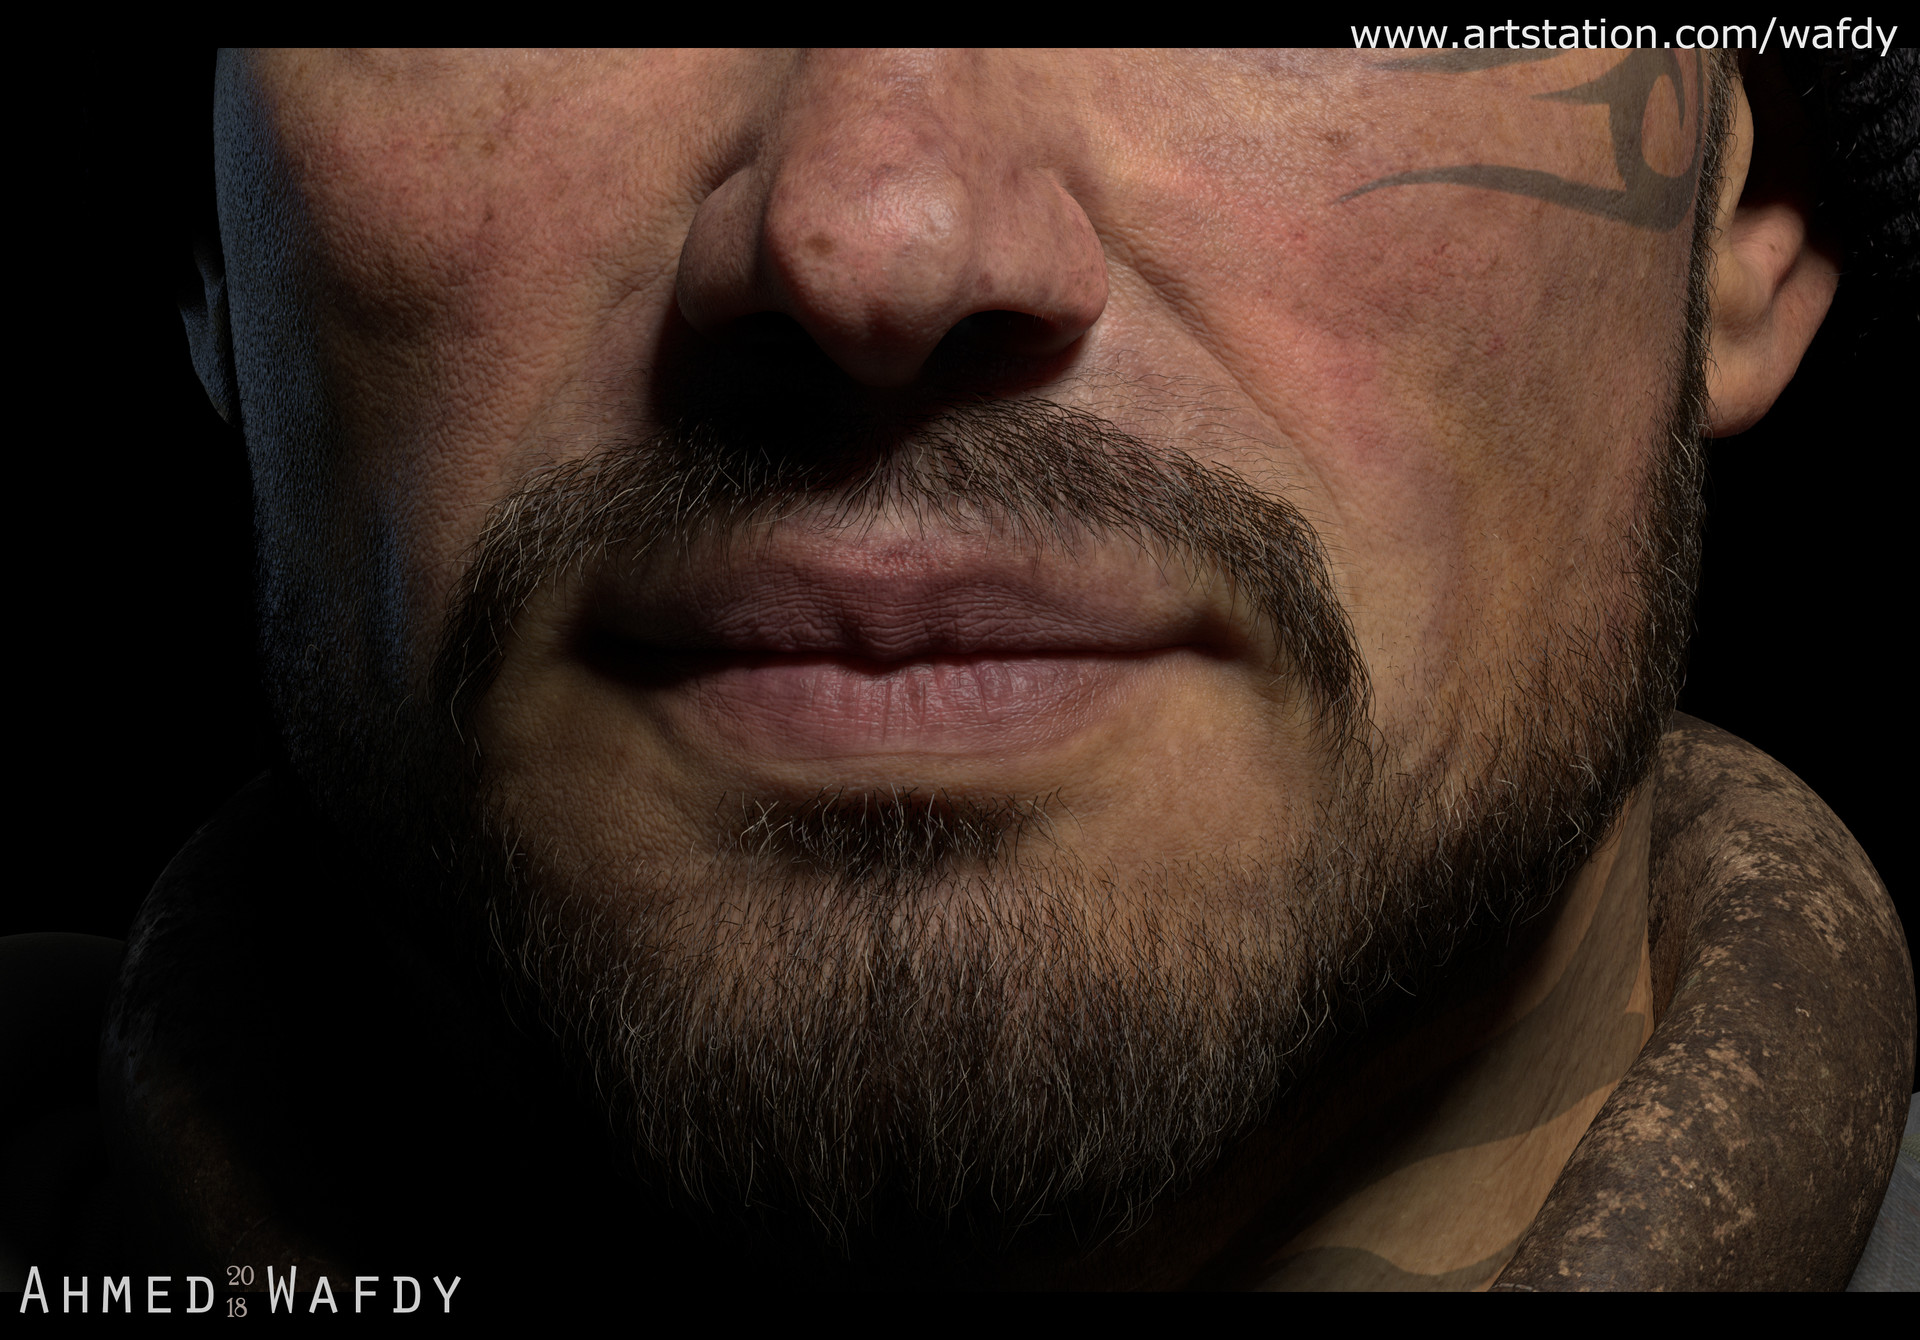 [Image: ahmed-wafdy-ahmed-wafdy-closeup-02.jpg?1515350624]